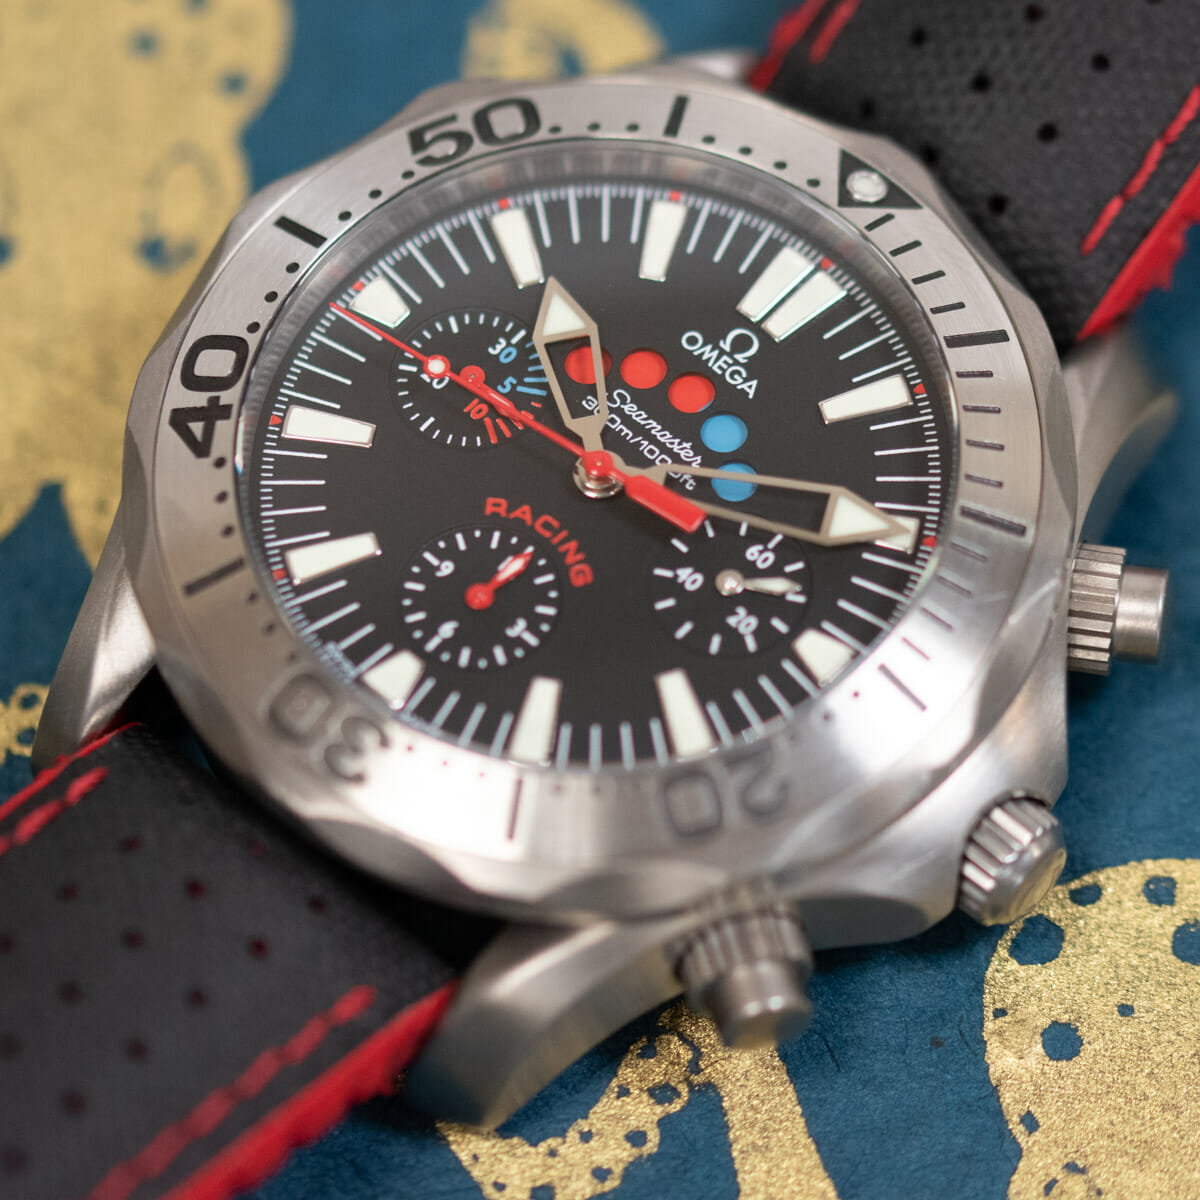 Extra Shot of Seamaster Racing Chronometer